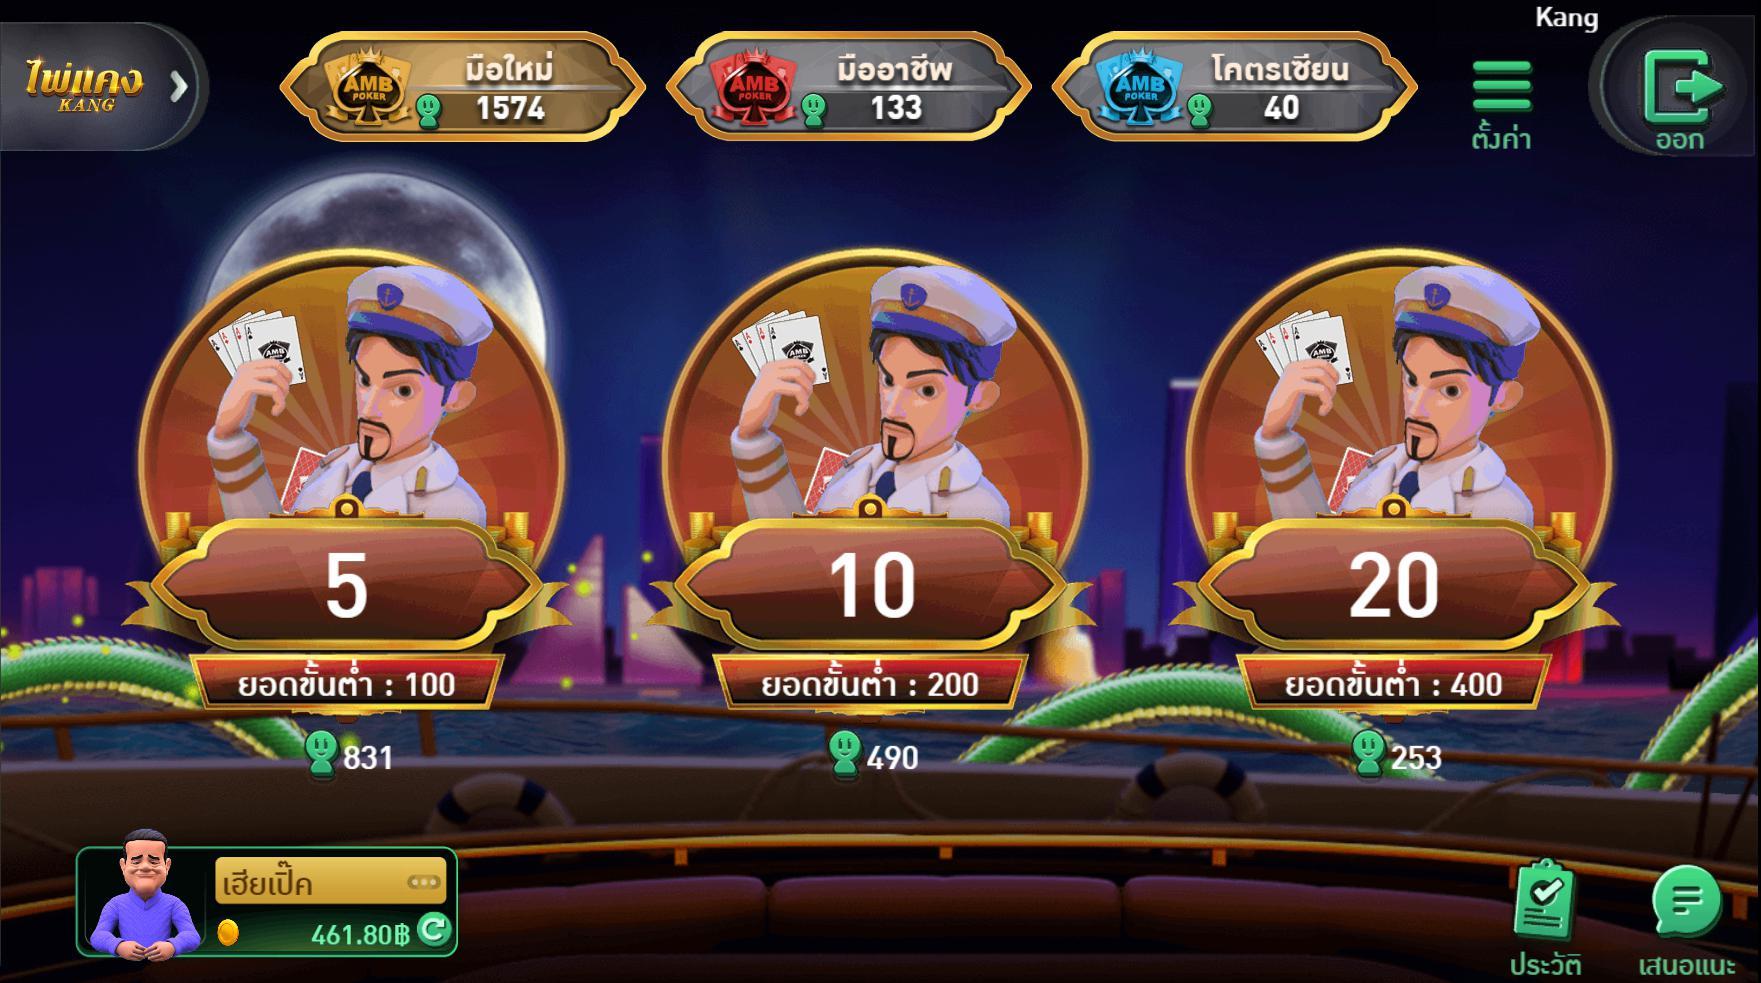 play-gamekangcard4